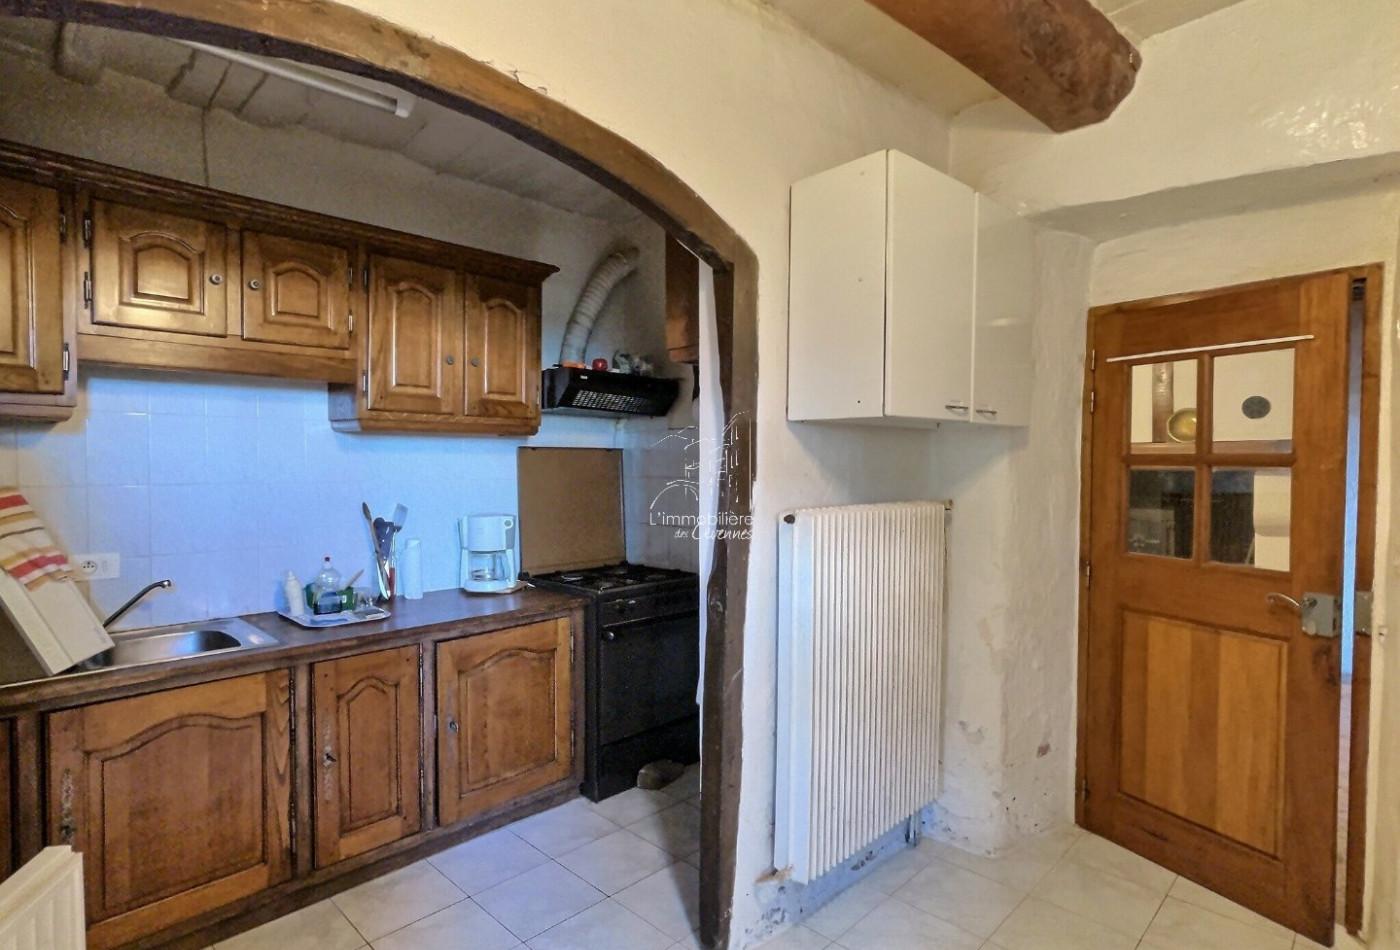 A vendre  Valleraugue | Réf 340292530 - Immo3d